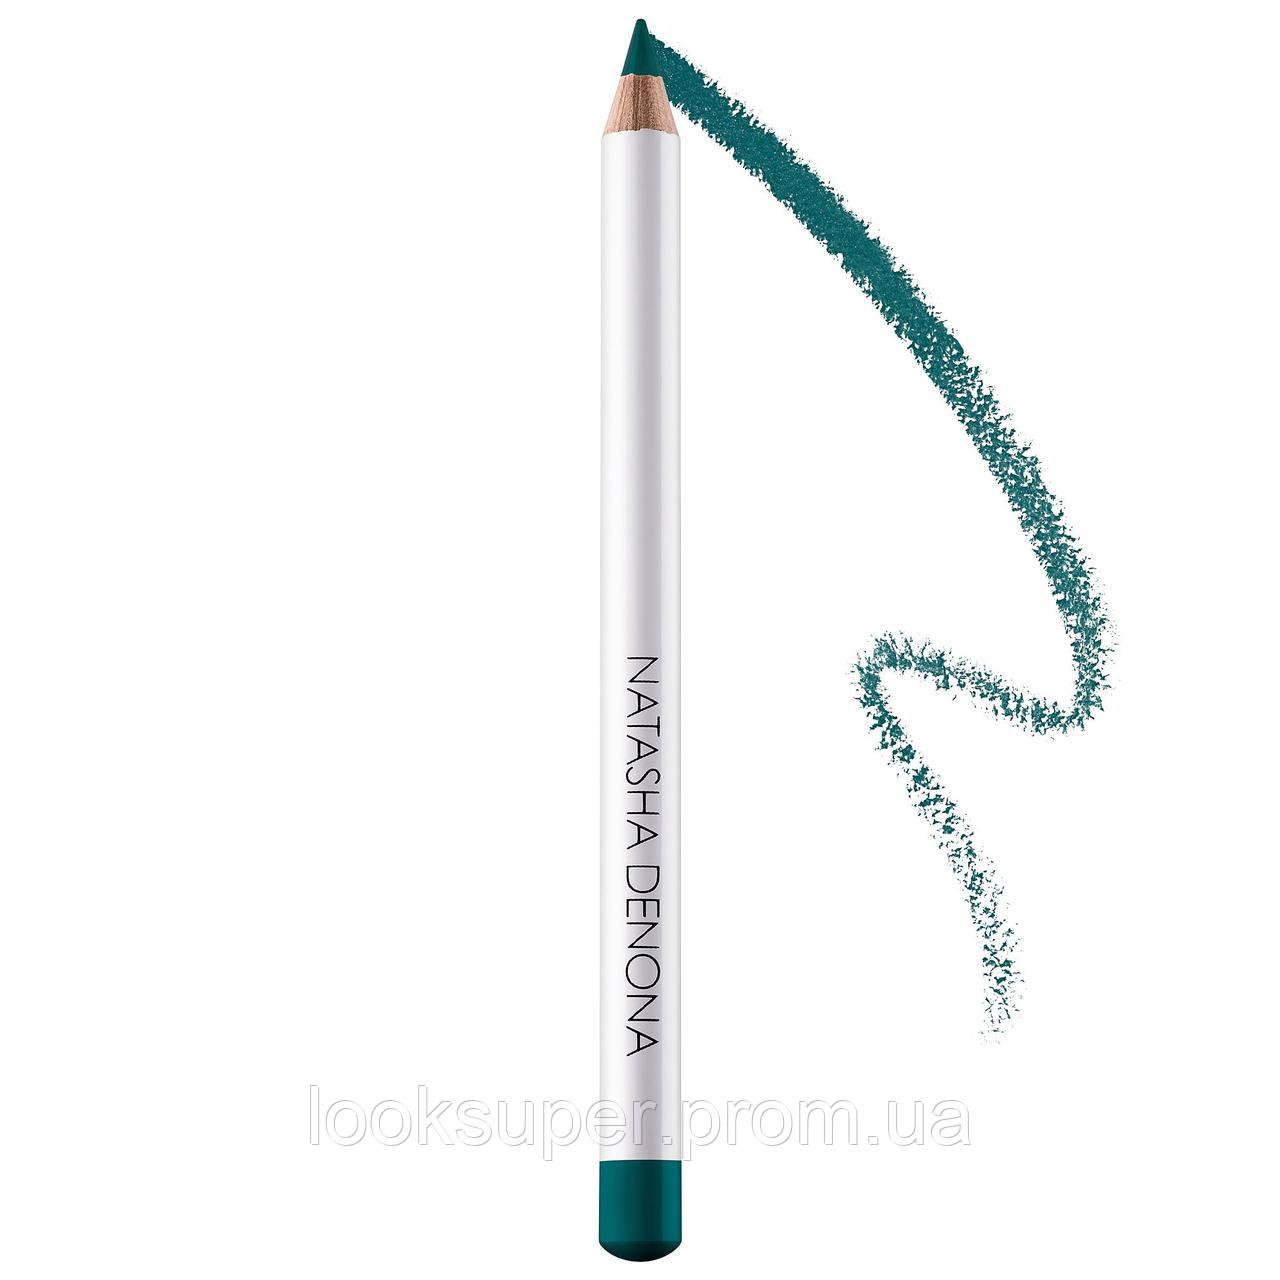 Карандаш для подводки глаз NATASHA DENONA  Eye Liner Pencil   deep teal